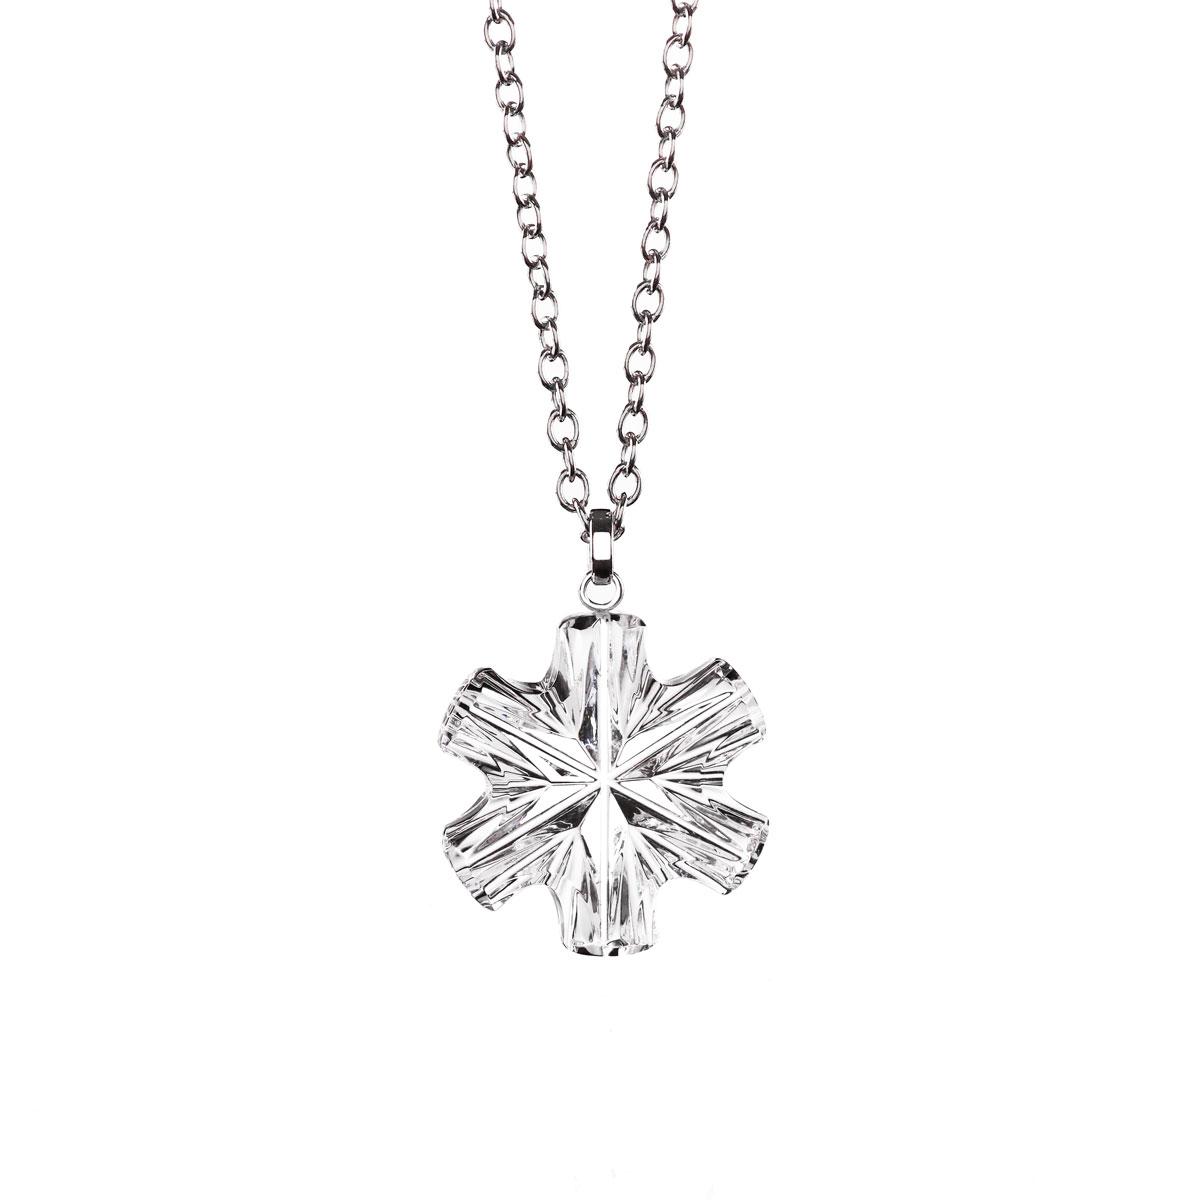 Cashs Ireland, Crystal Snowflake Pendant Necklace, Small